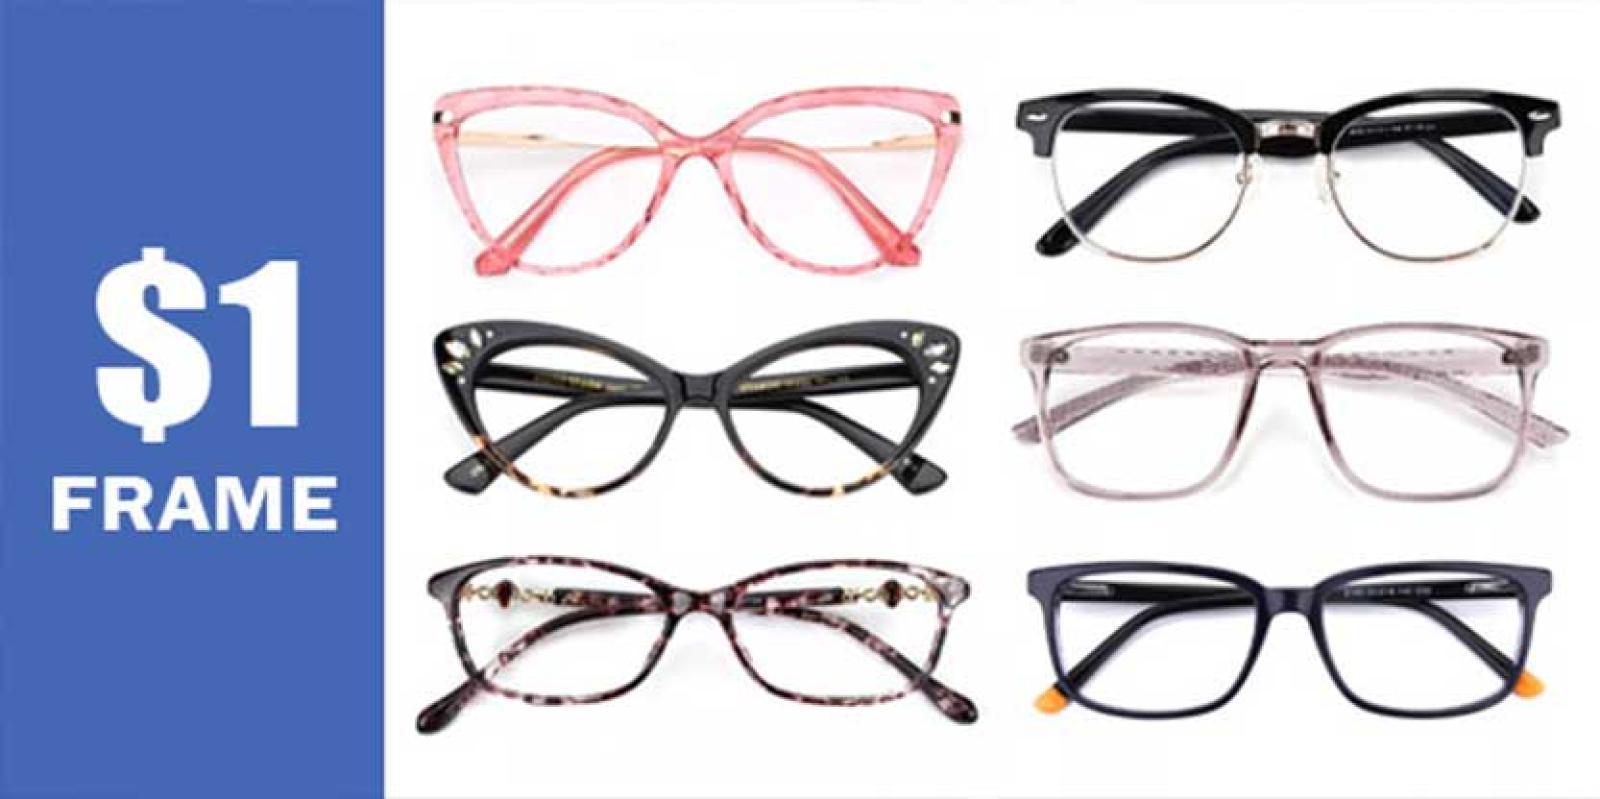 1.67 Digital Free Form Progressive (No-line multi-focal)-Translucent---Eyeglasses-additional3